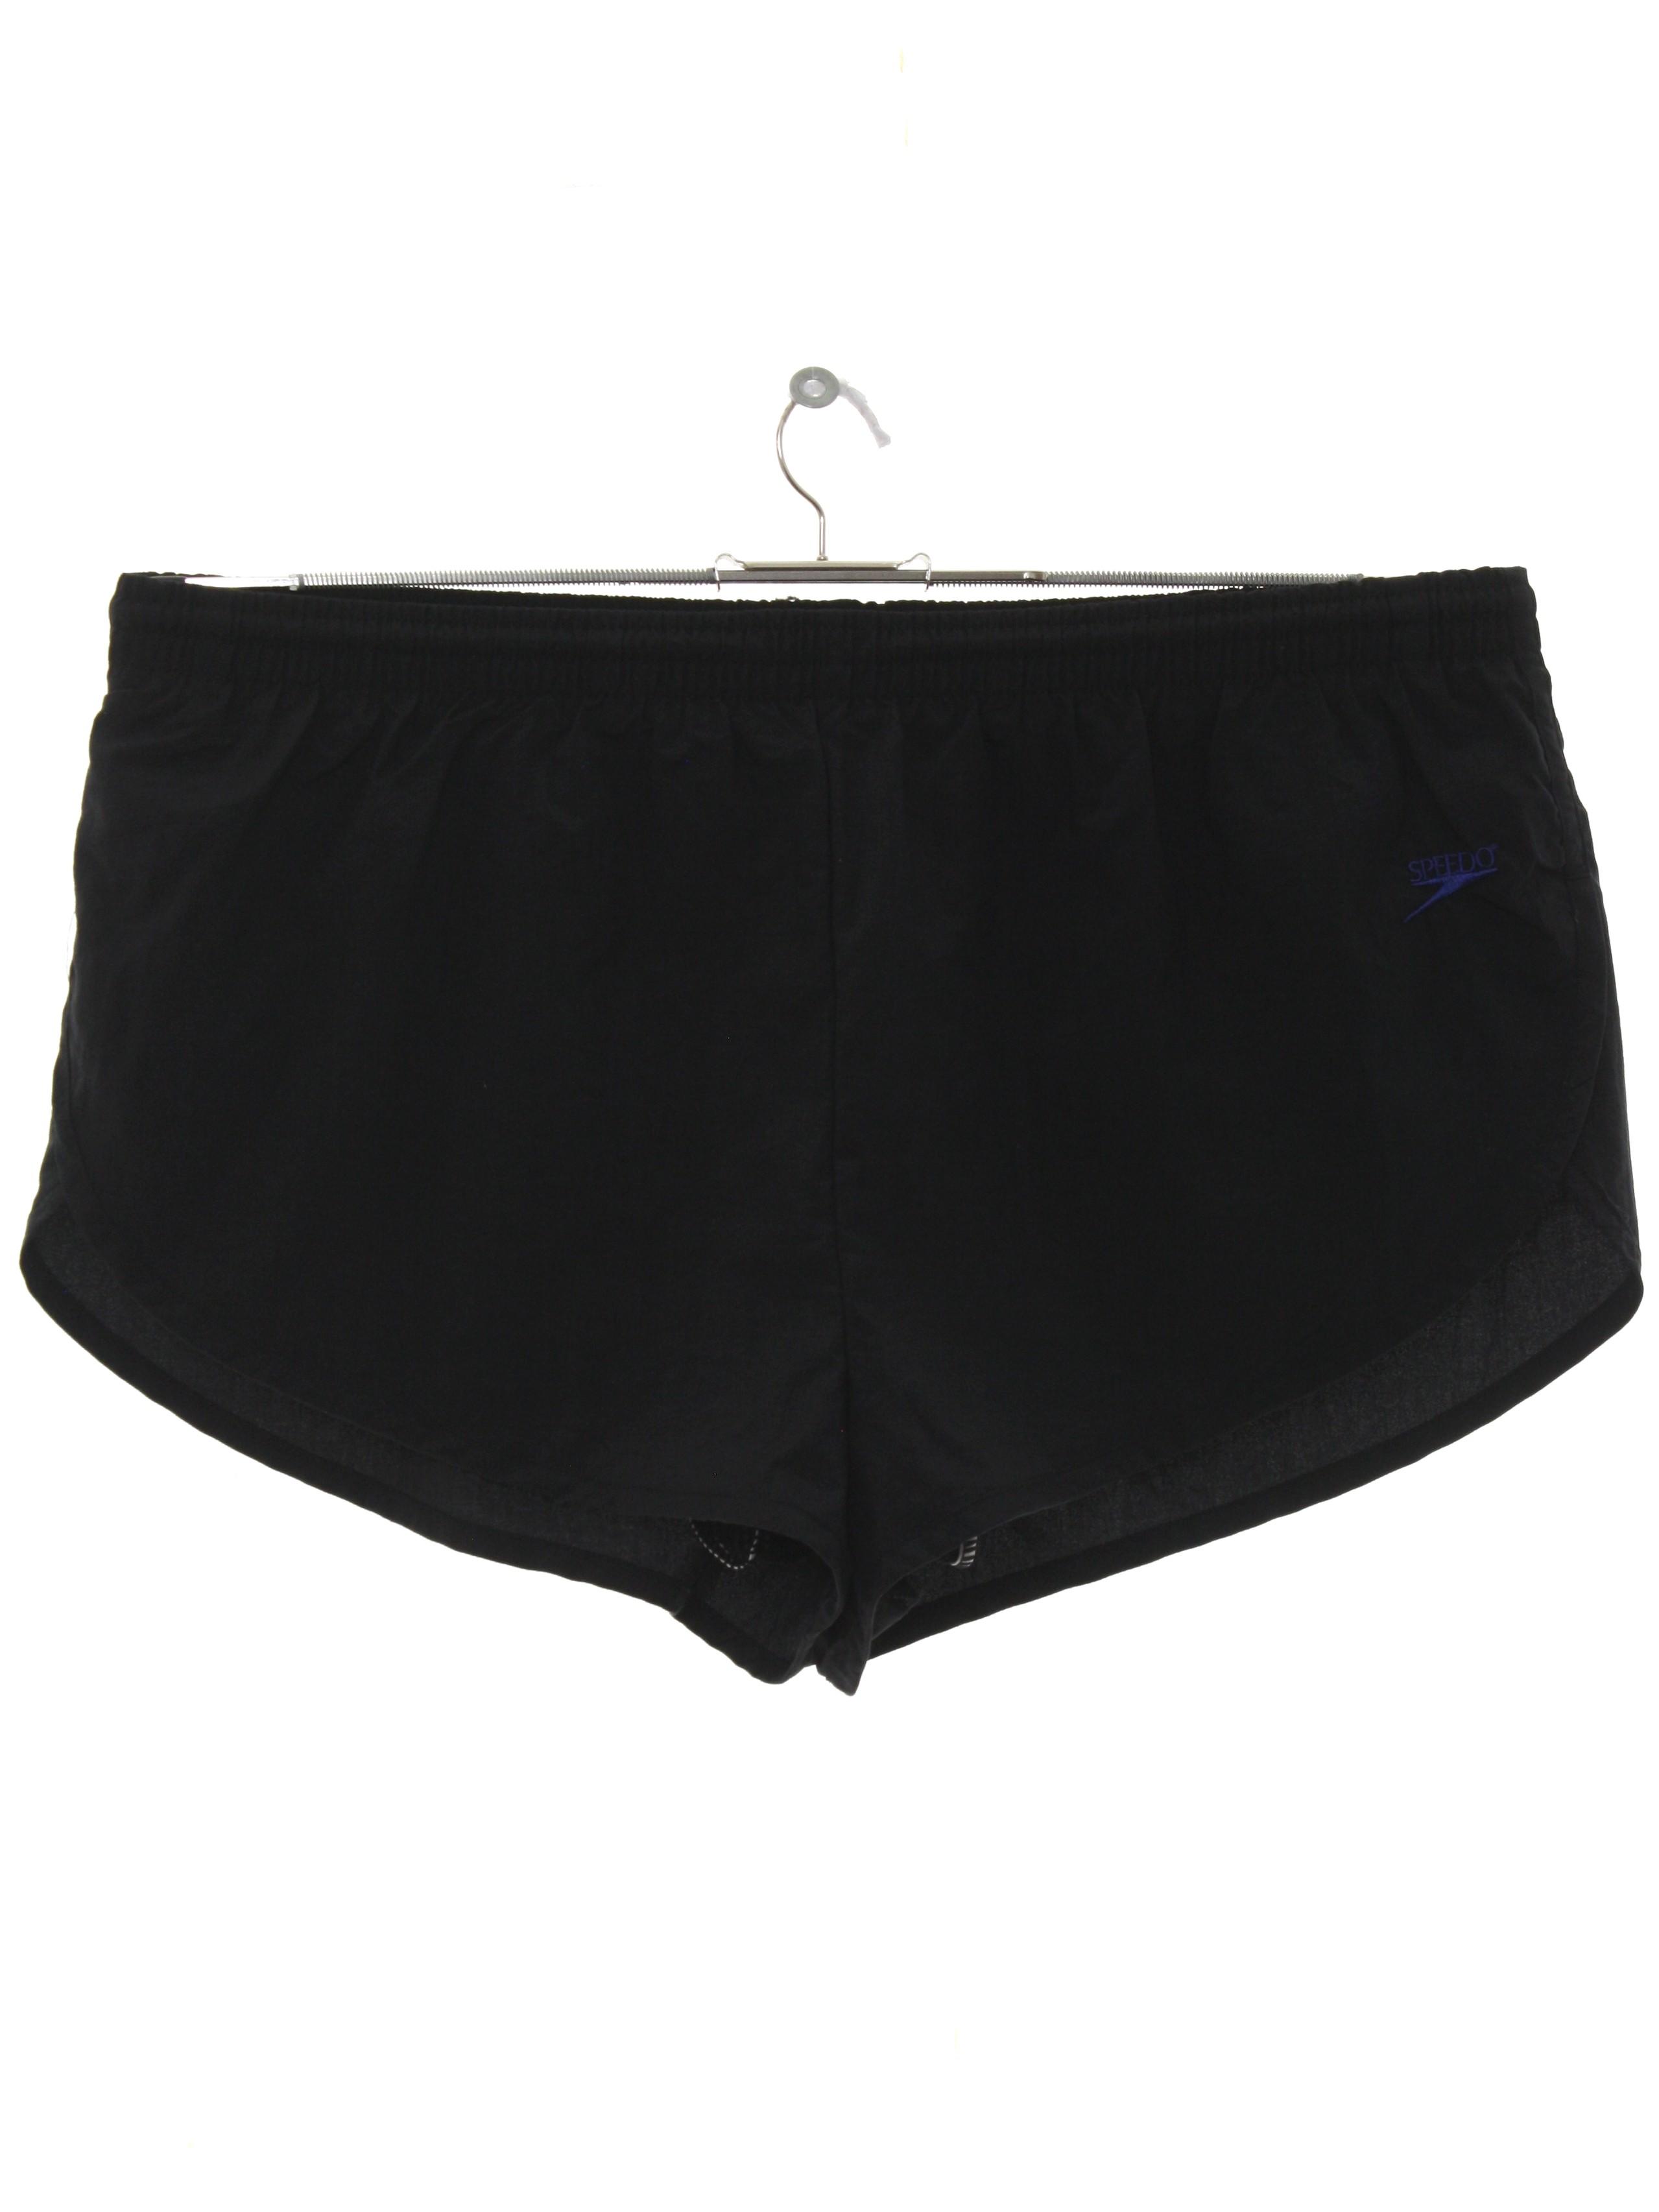 ec74db67de Vintage 1990's Swimsuit/Swimwear: 90s -Speedo- Mens black background nylon  wicked 90s swim shorts with elastic drawstring waistband, full mesh  polyester ...